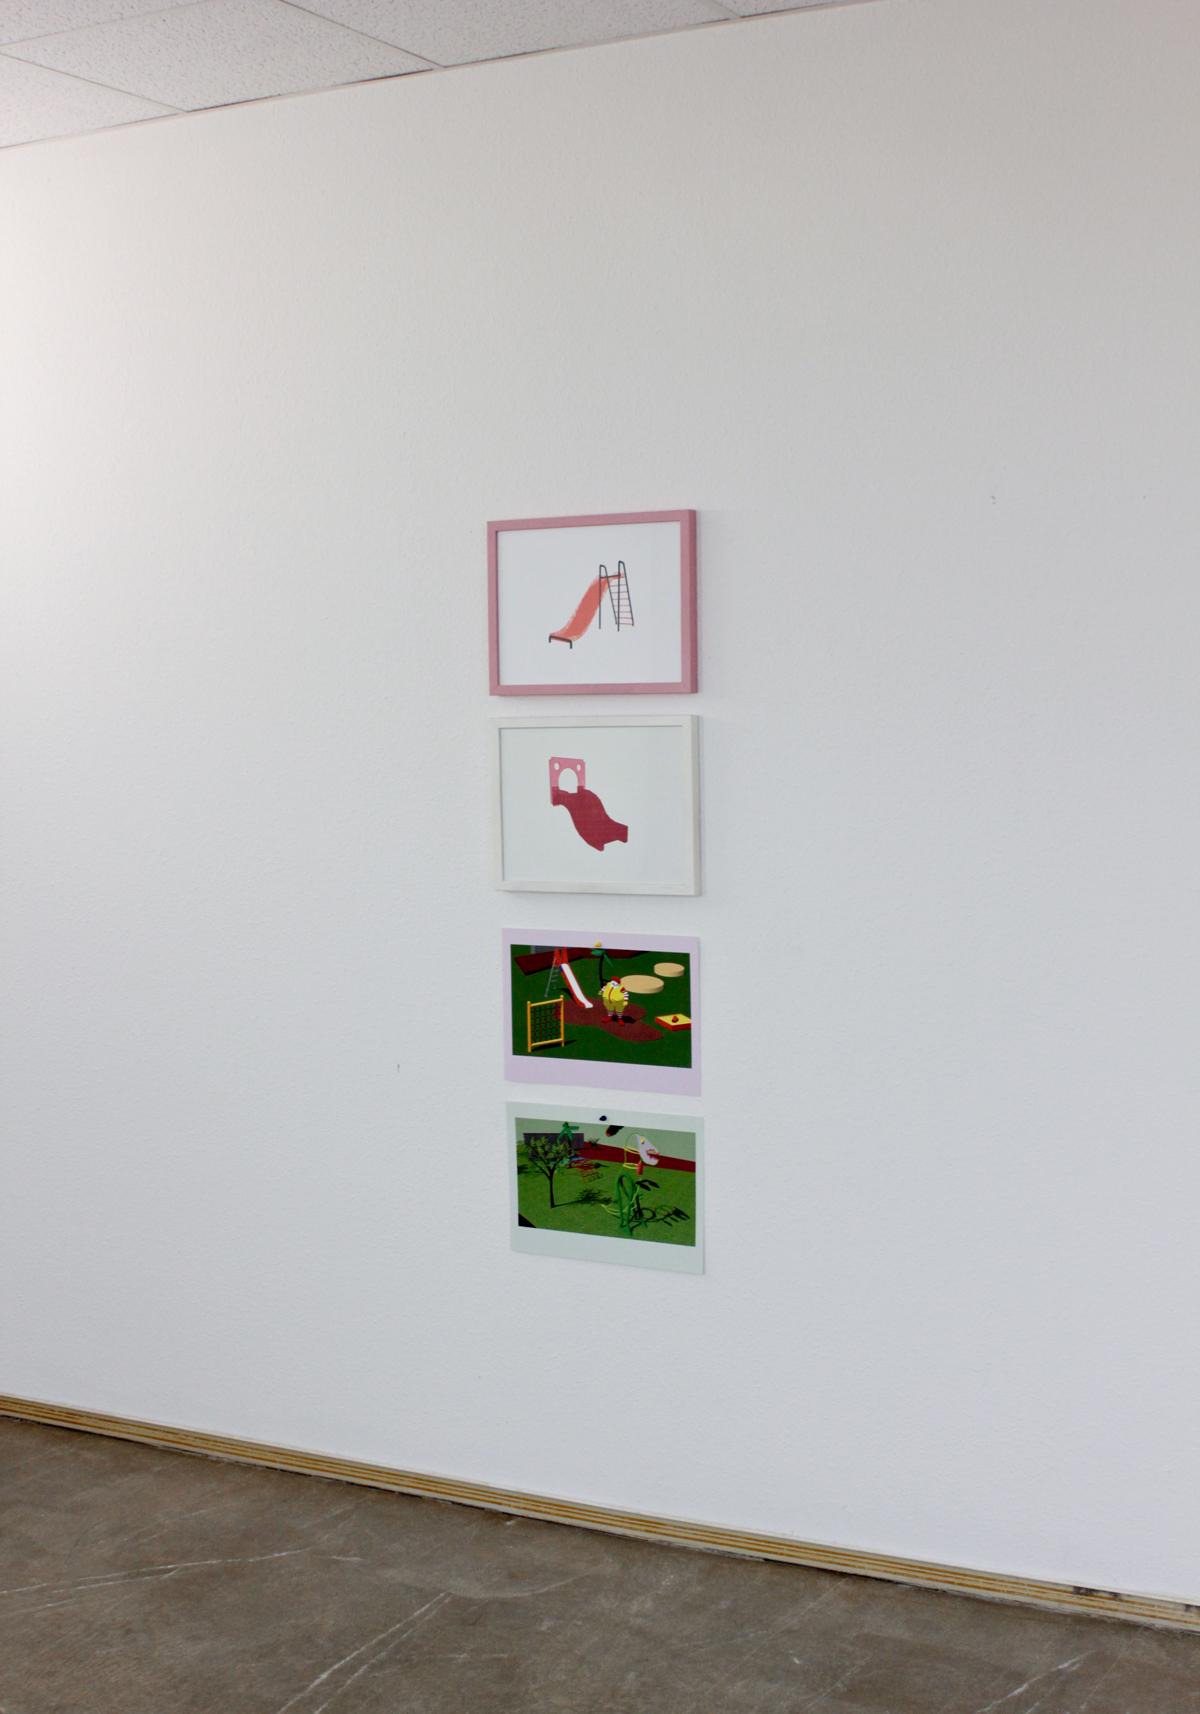 exhibition_view__Studio_LOES_Raiko_Sanchez6